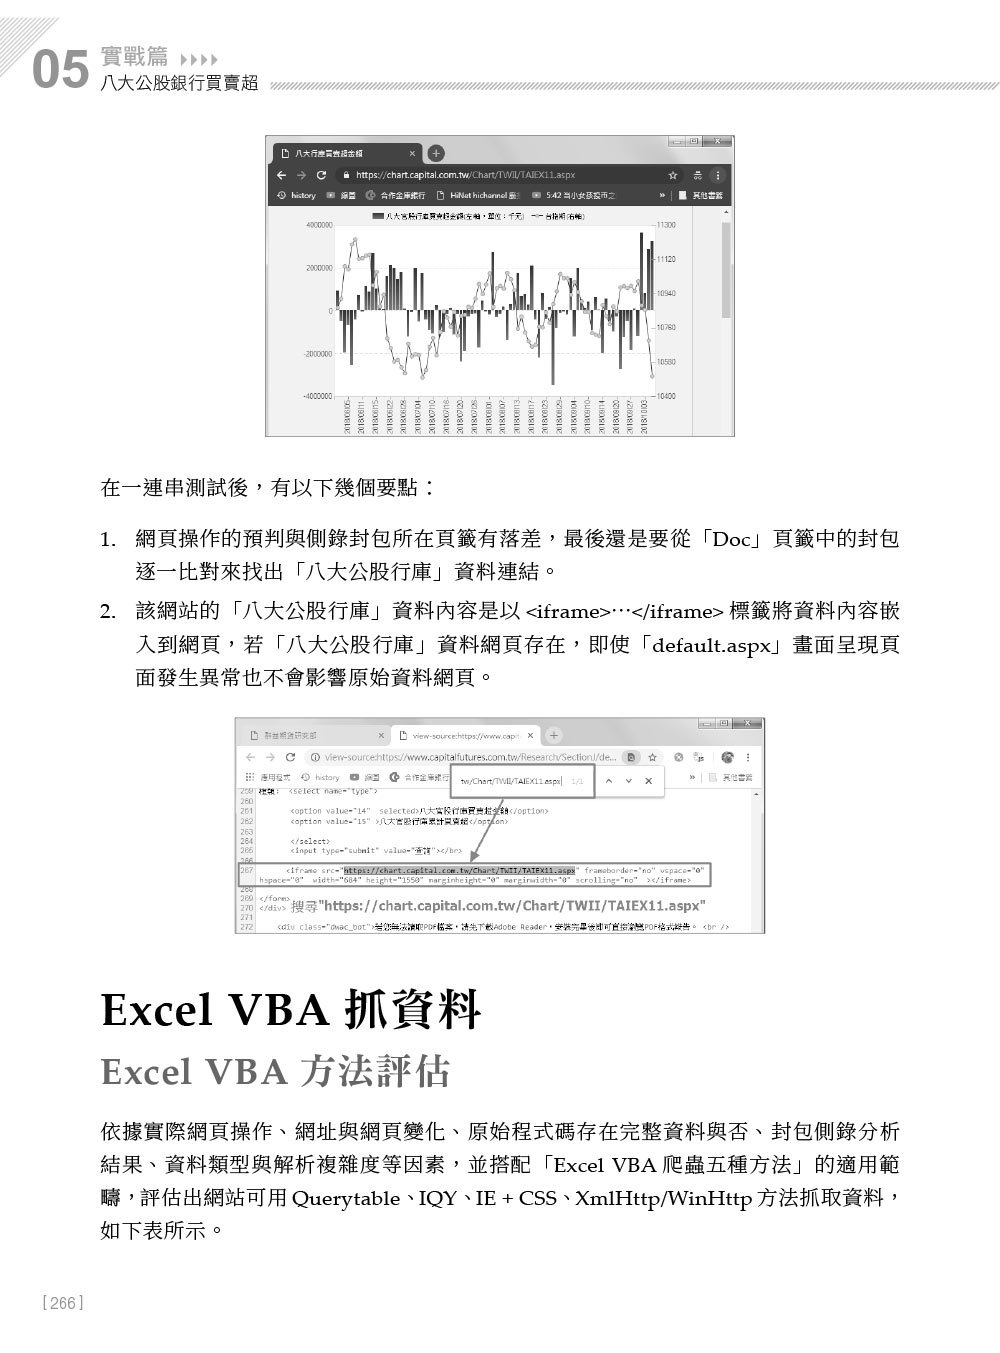 Excel VBA 實戰技巧|金融數據 x 網路爬蟲-preview-9